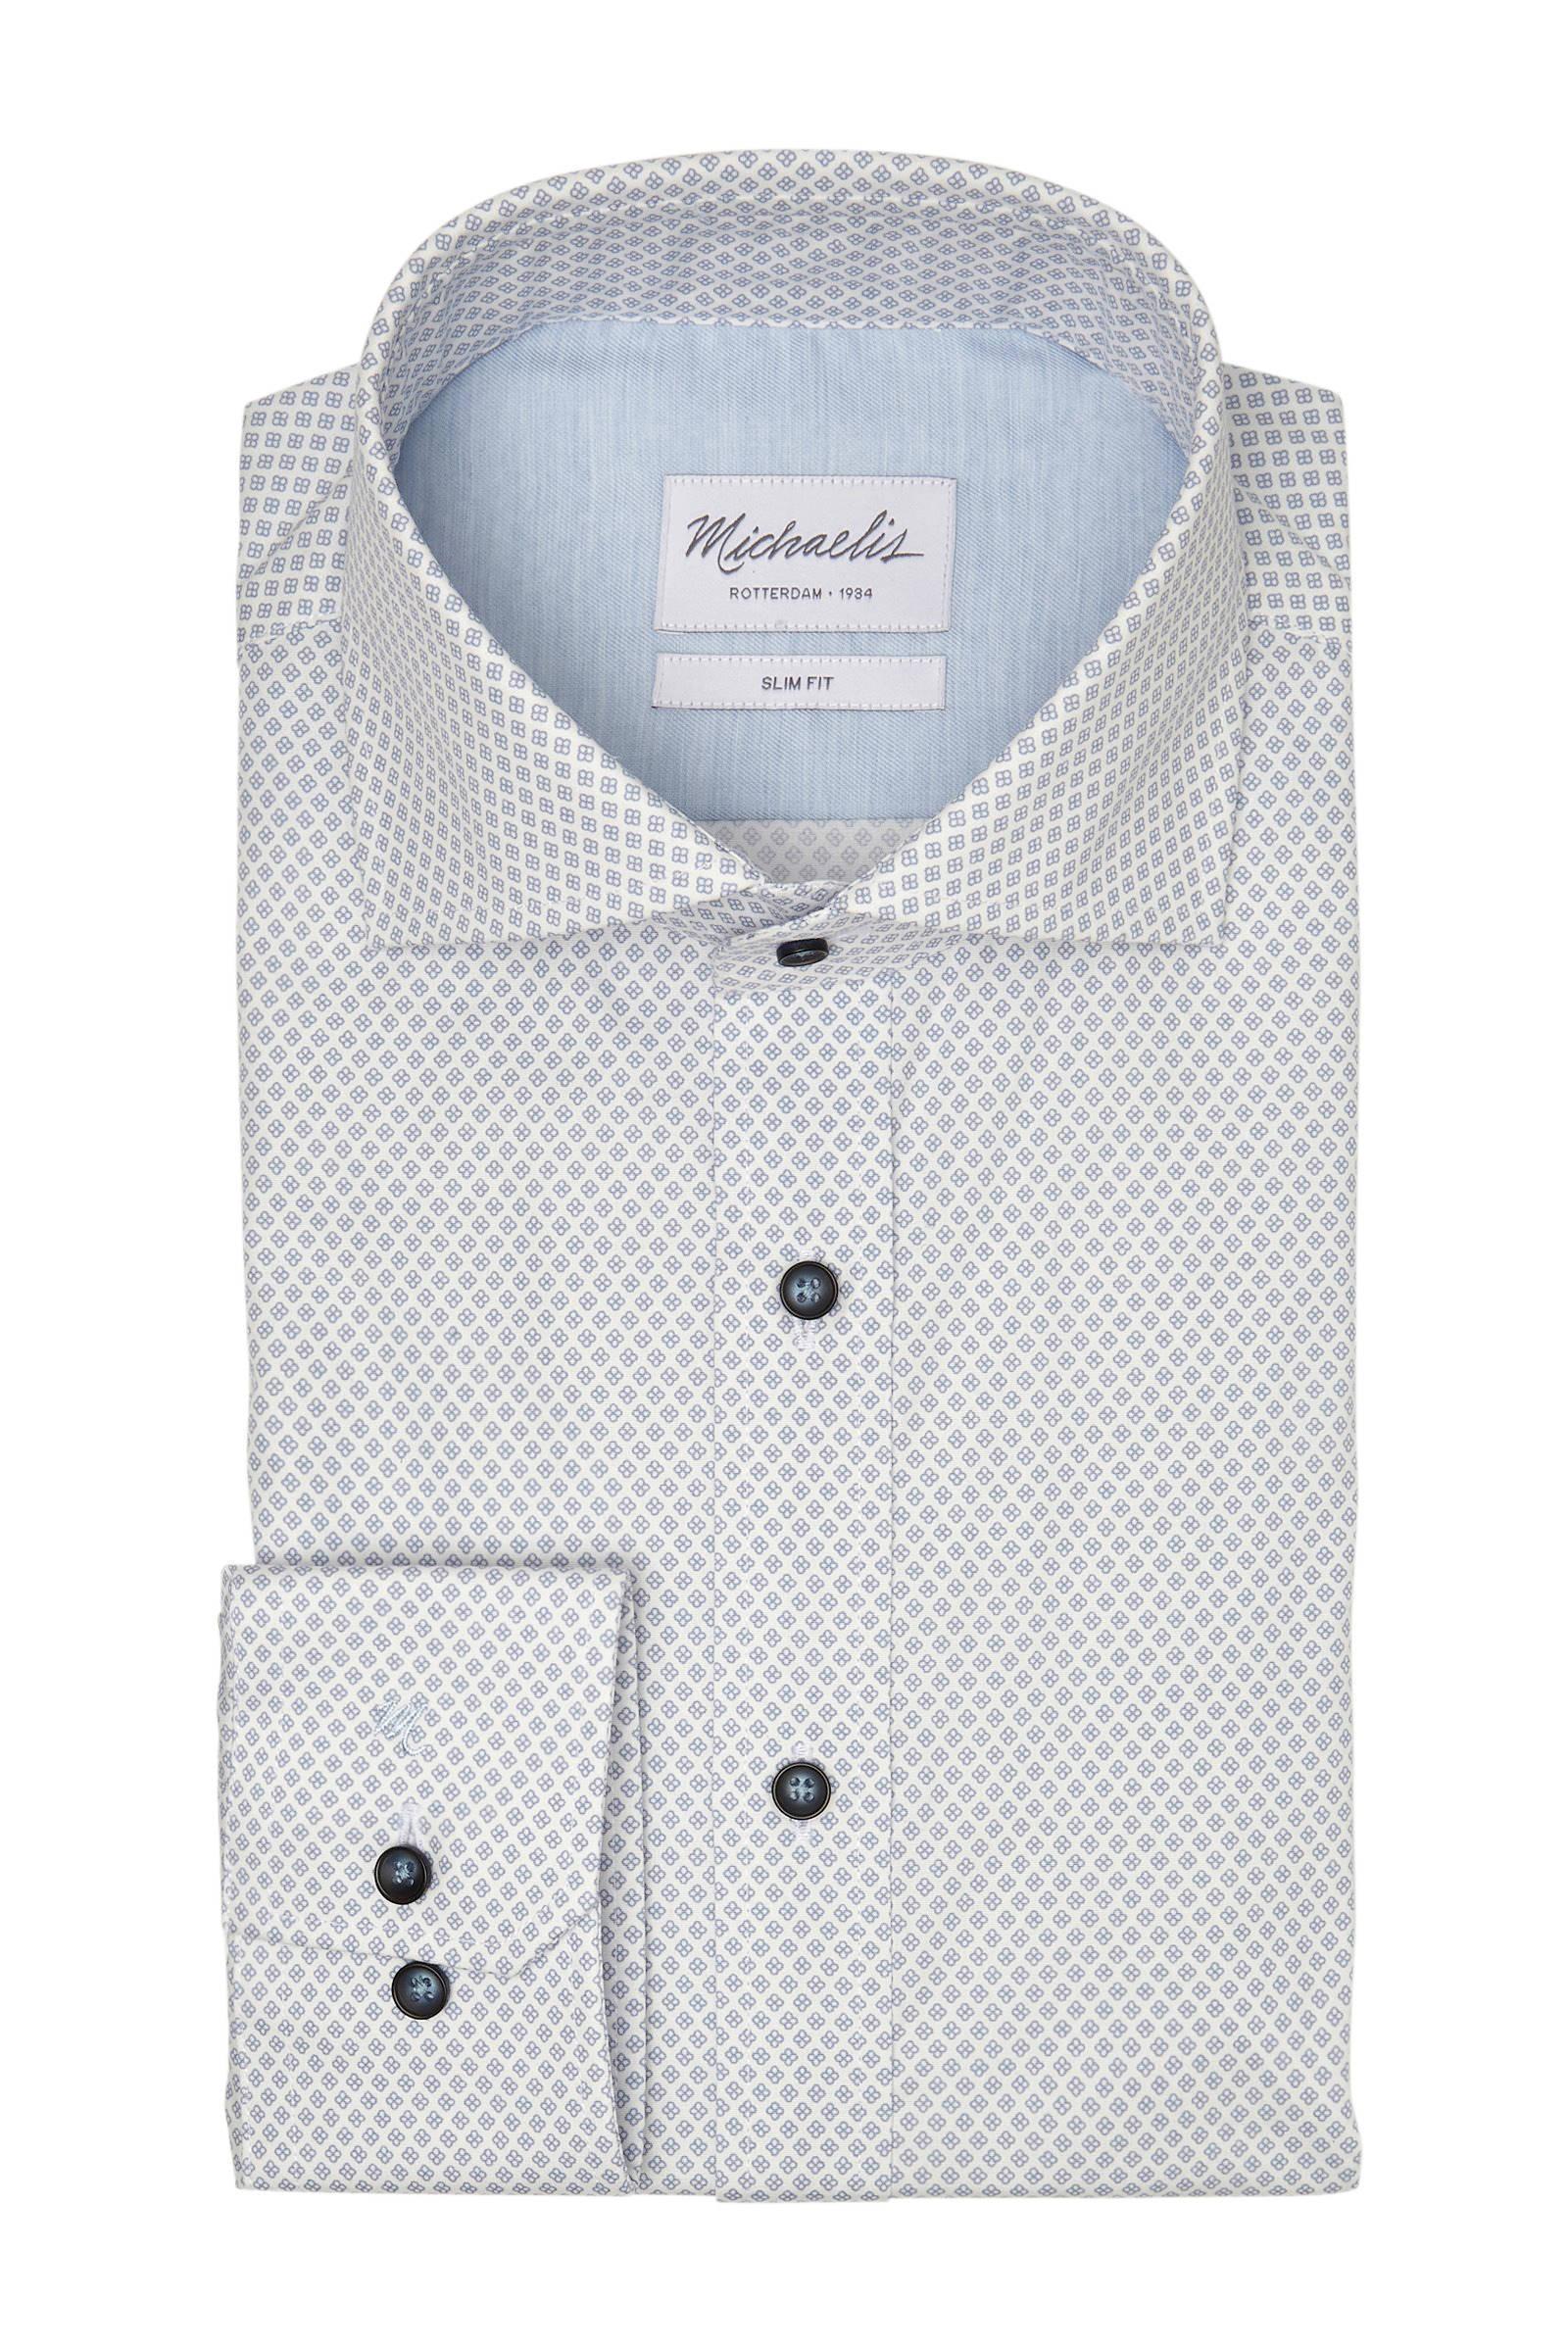 Michaelis Slim Fit overhemd, galaxy print SALE tot 50